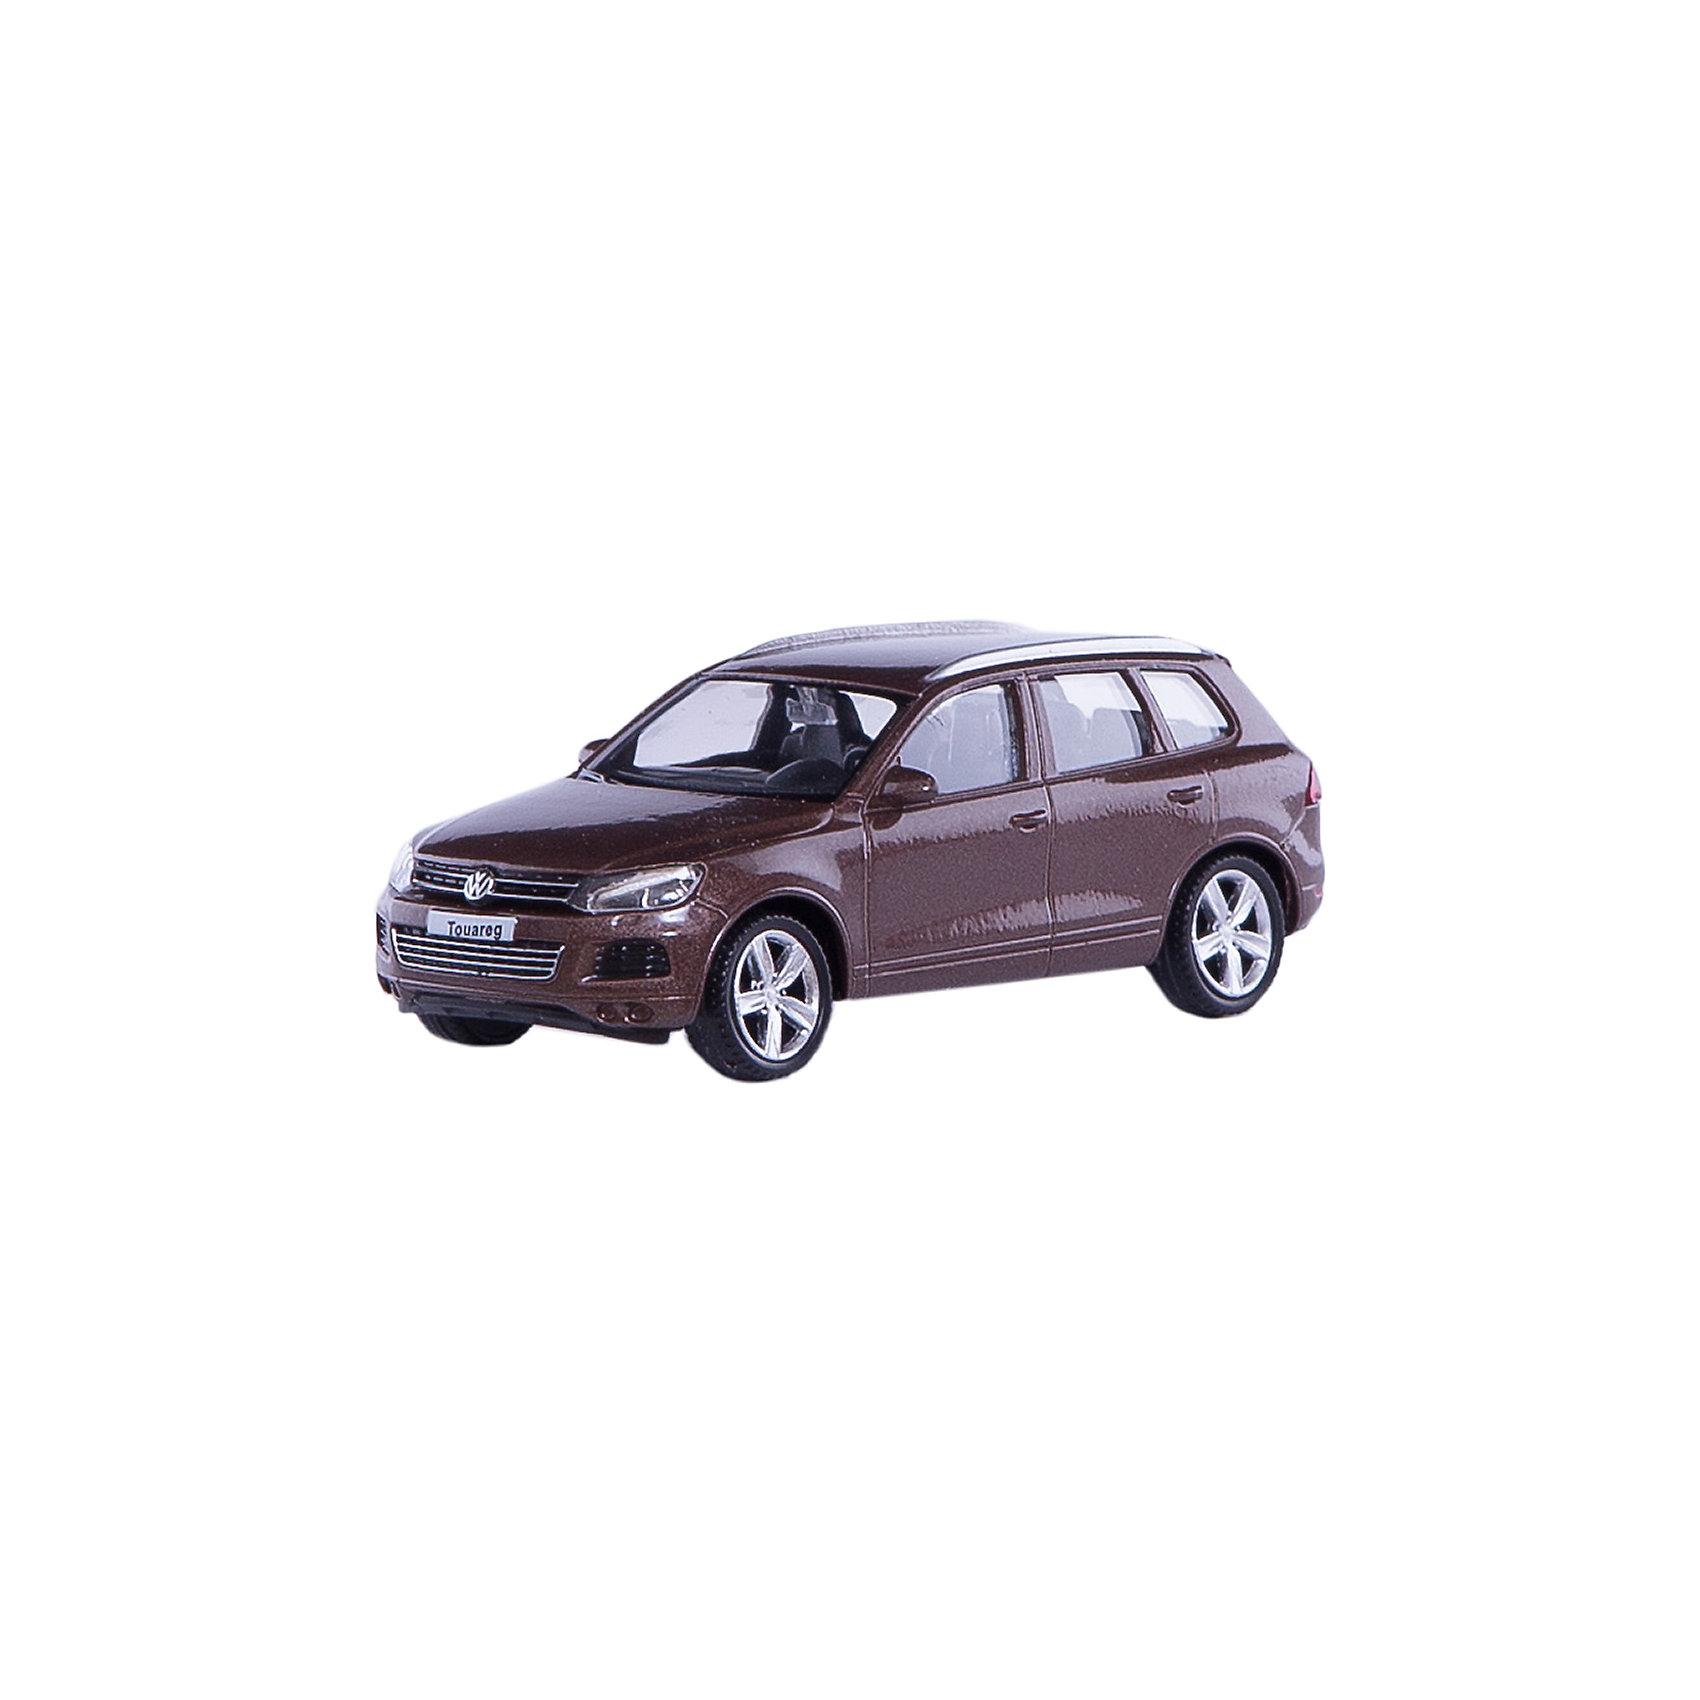 Машинка Volkswagen Touareg 4, AutotimeМашинки<br><br><br>Ширина мм: 165<br>Глубина мм: 57<br>Высота мм: 75<br>Вес г: 13<br>Возраст от месяцев: 36<br>Возраст до месяцев: 2147483647<br>Пол: Мужской<br>Возраст: Детский<br>SKU: 5584096